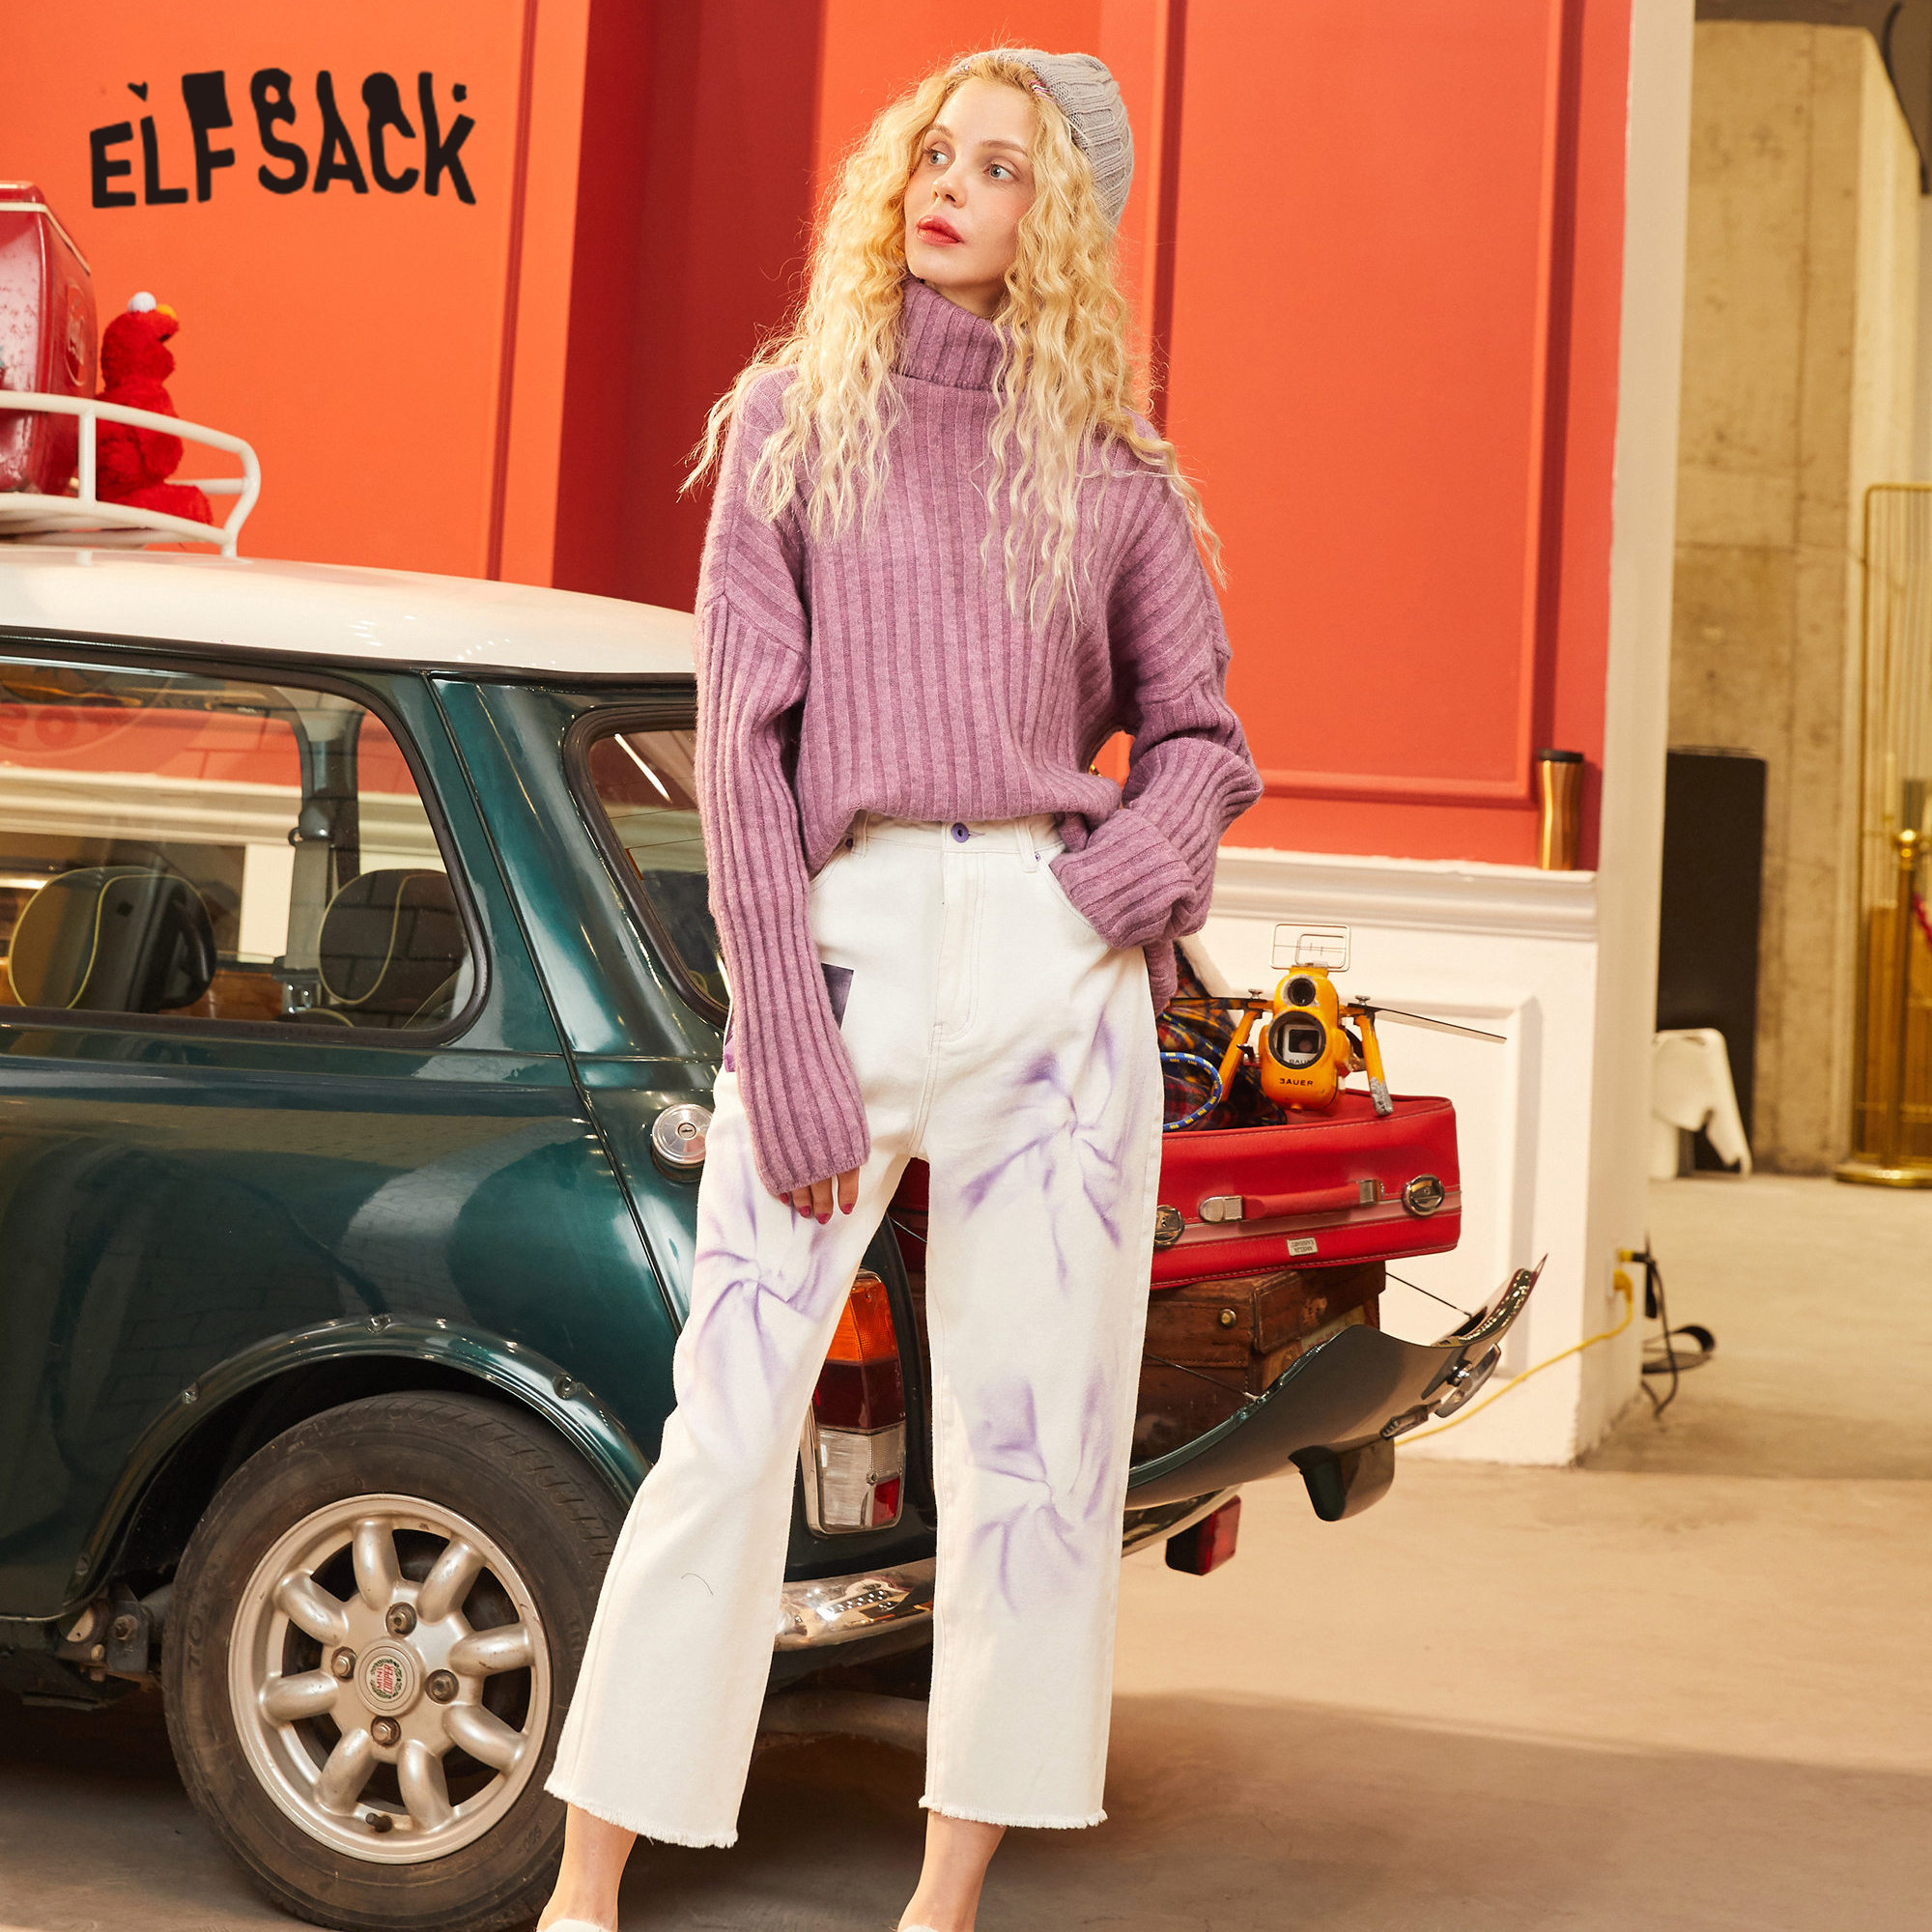 ELFSACK White Graphic Print Straight Casual Women Pants 2020 Spring New Colorblock High Waist Korean Ladies Daily Trouser